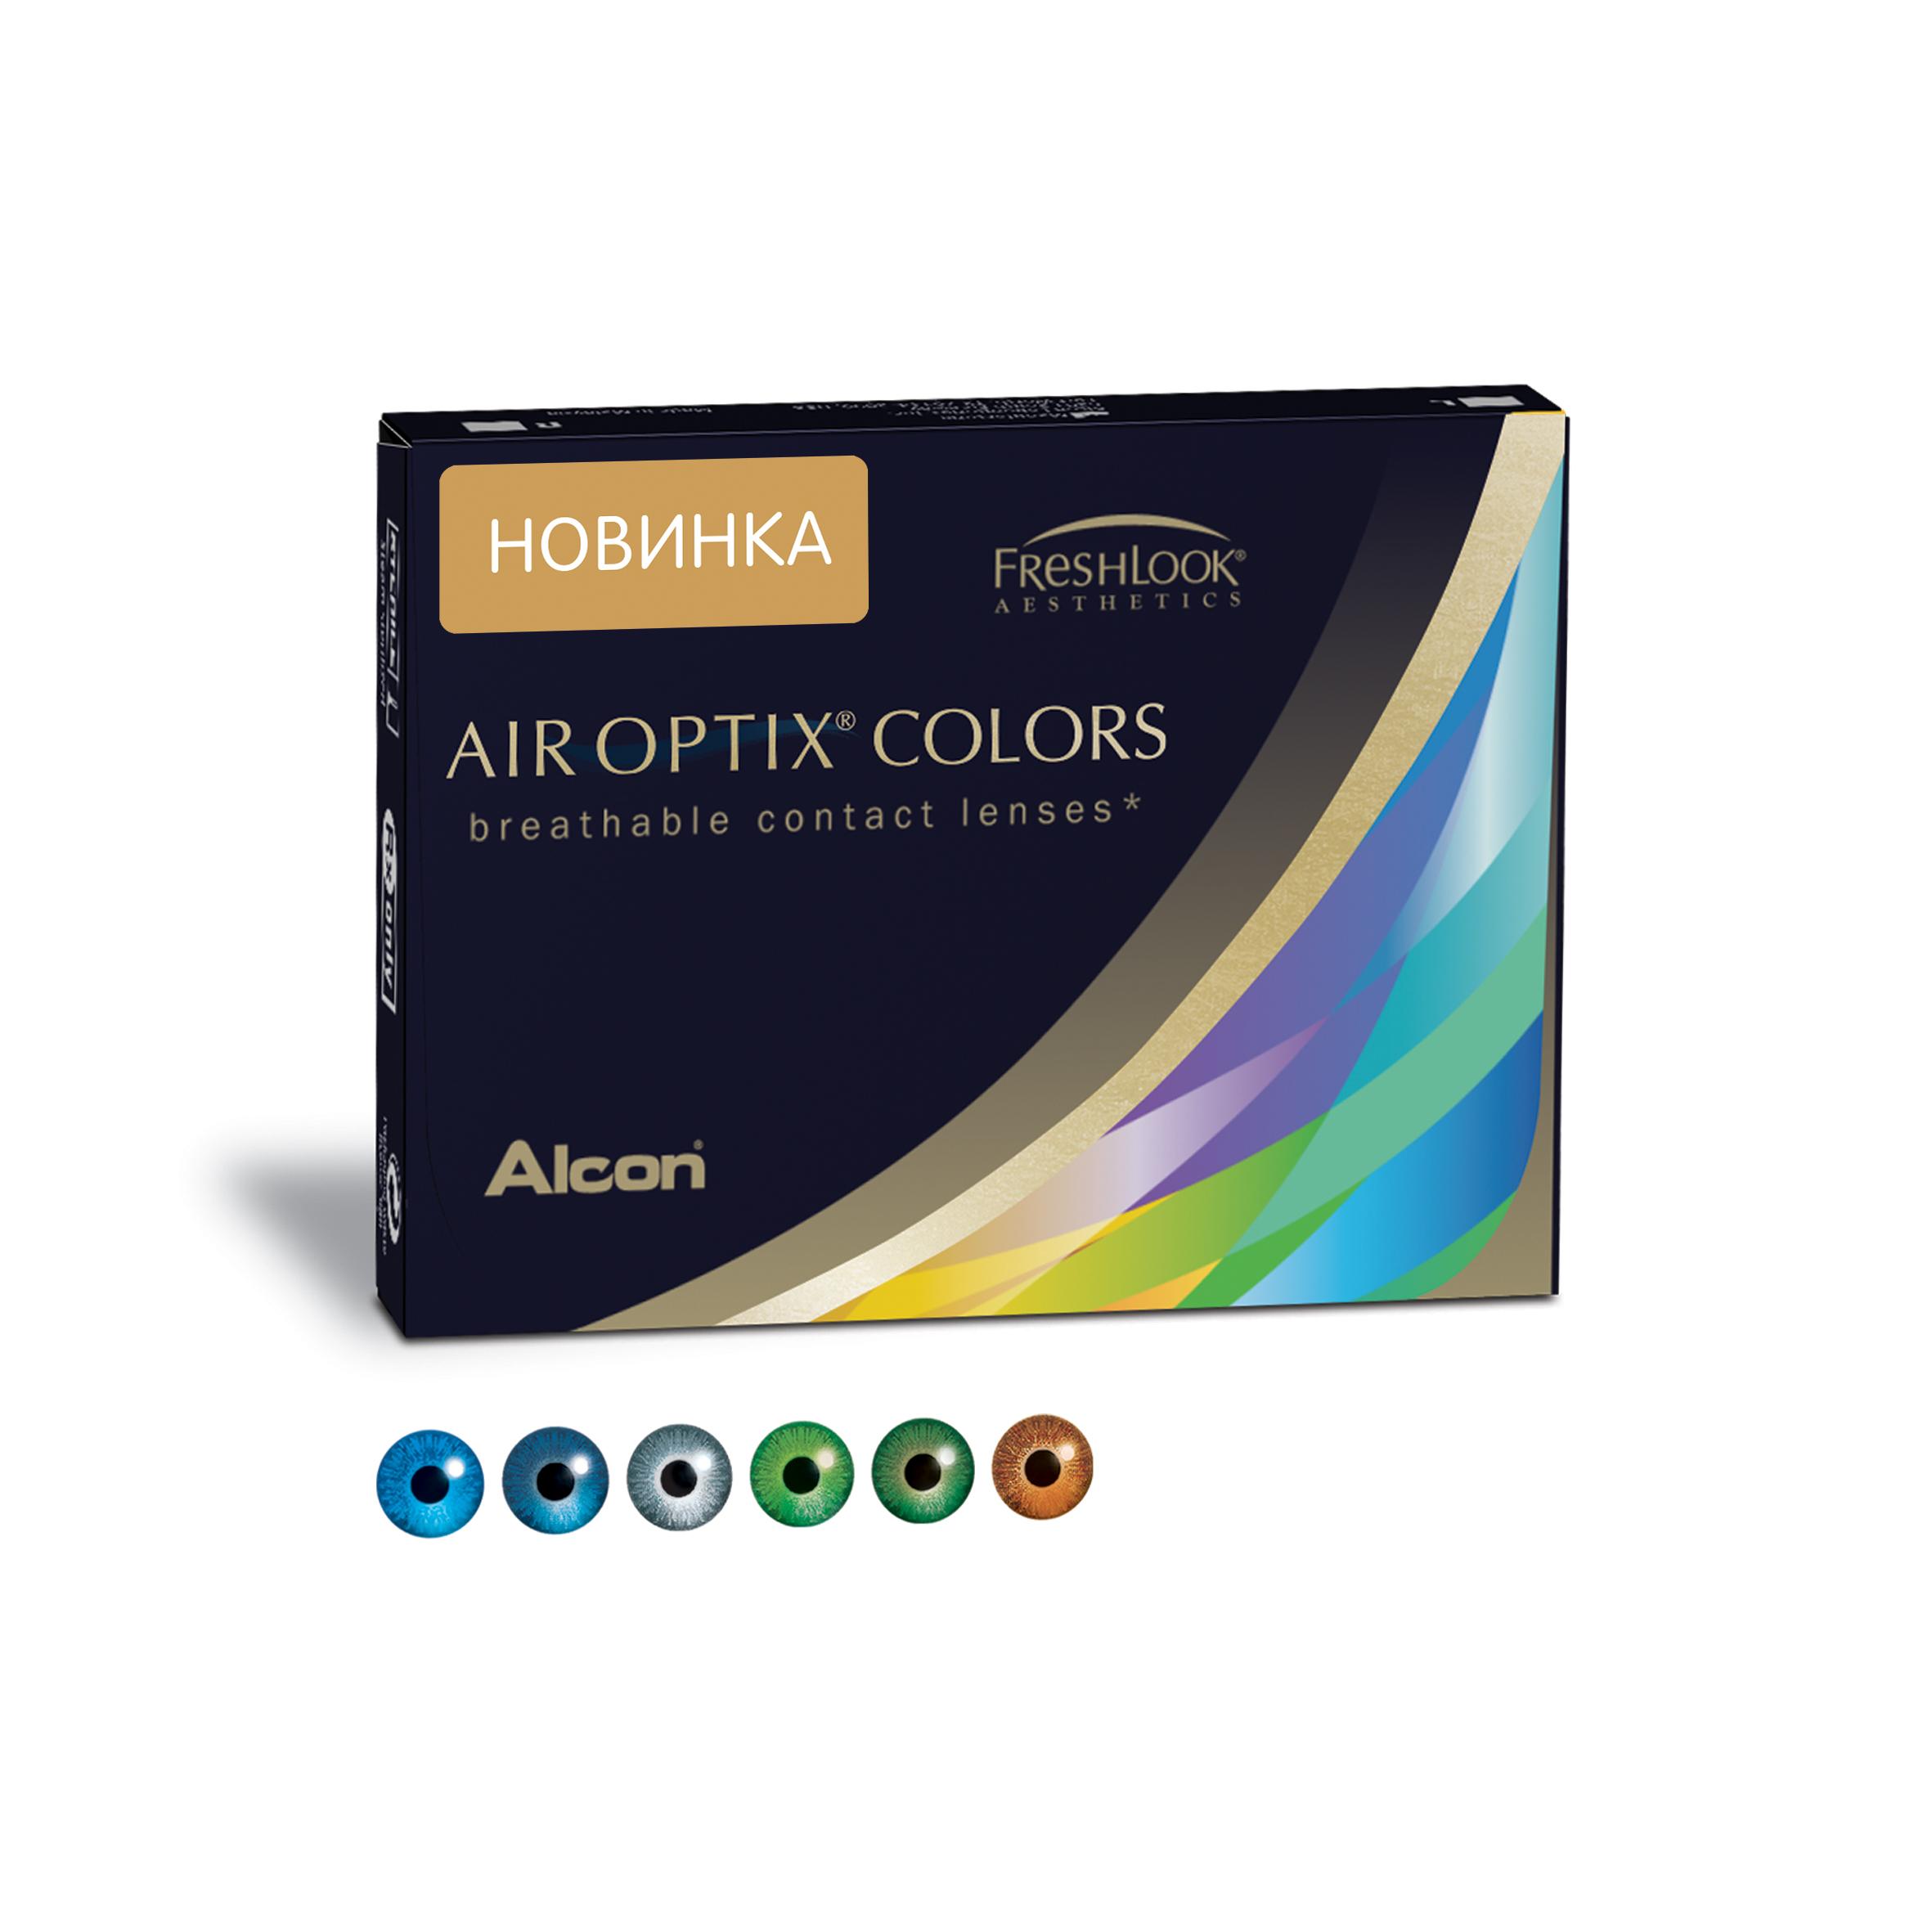 Аlcon контактные линзы Air Optix Colors 2 шт -0.50 Green31746108Мягкие контактные линзы